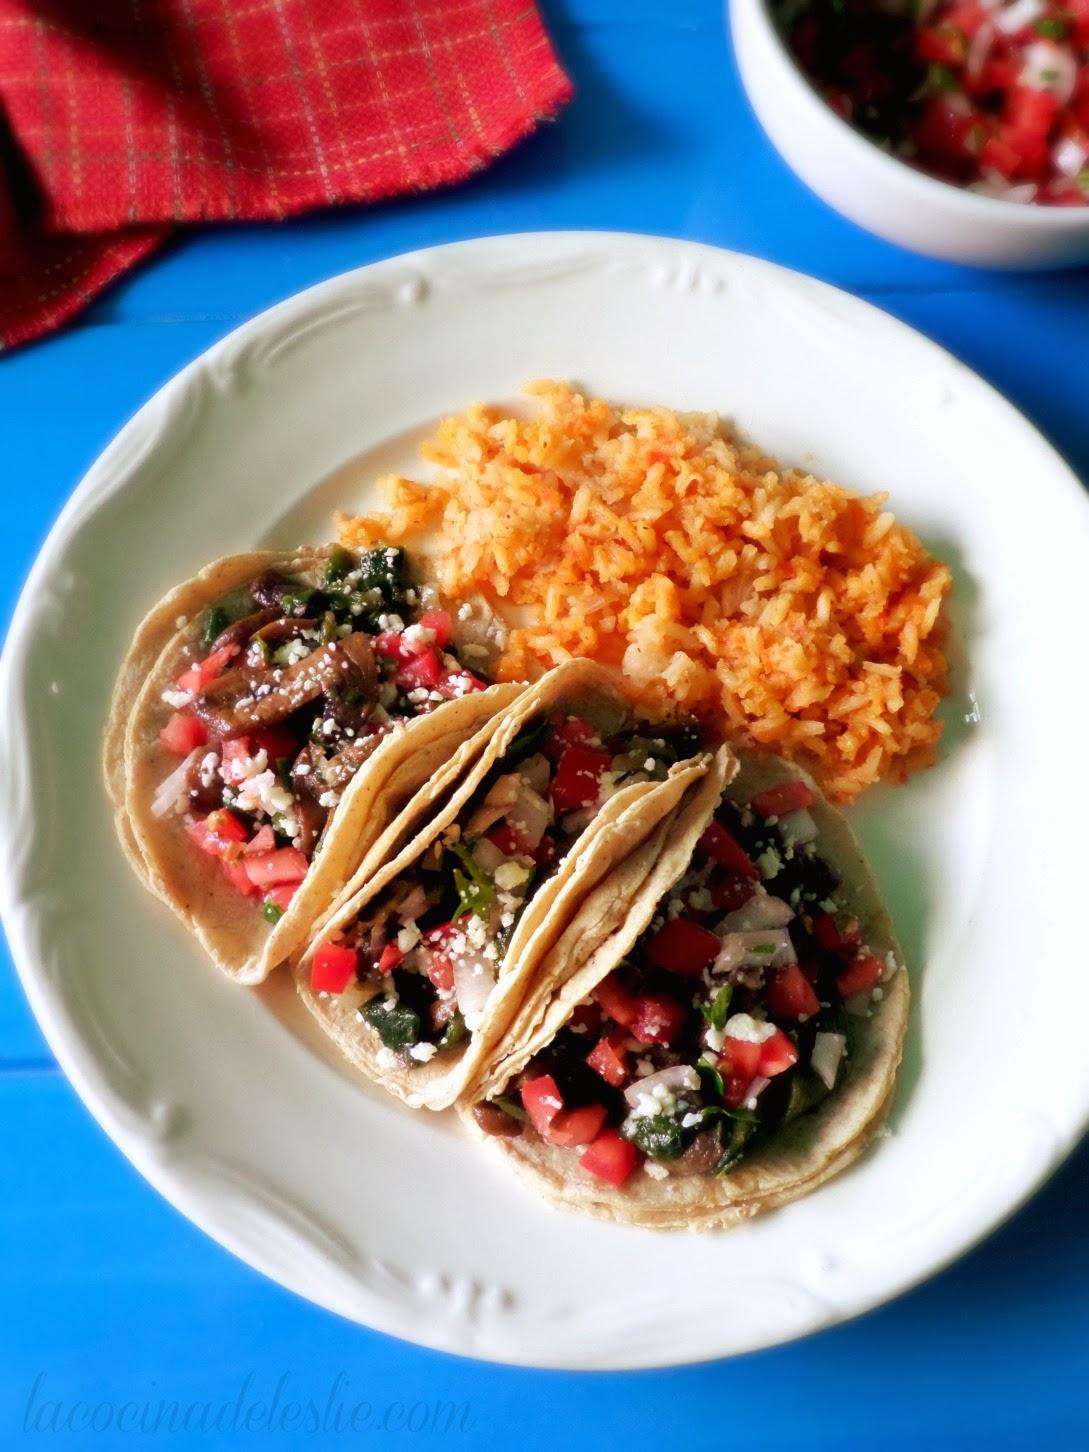 Meatless Mushroom Poblano Tacos - lacocinadeleslie.com